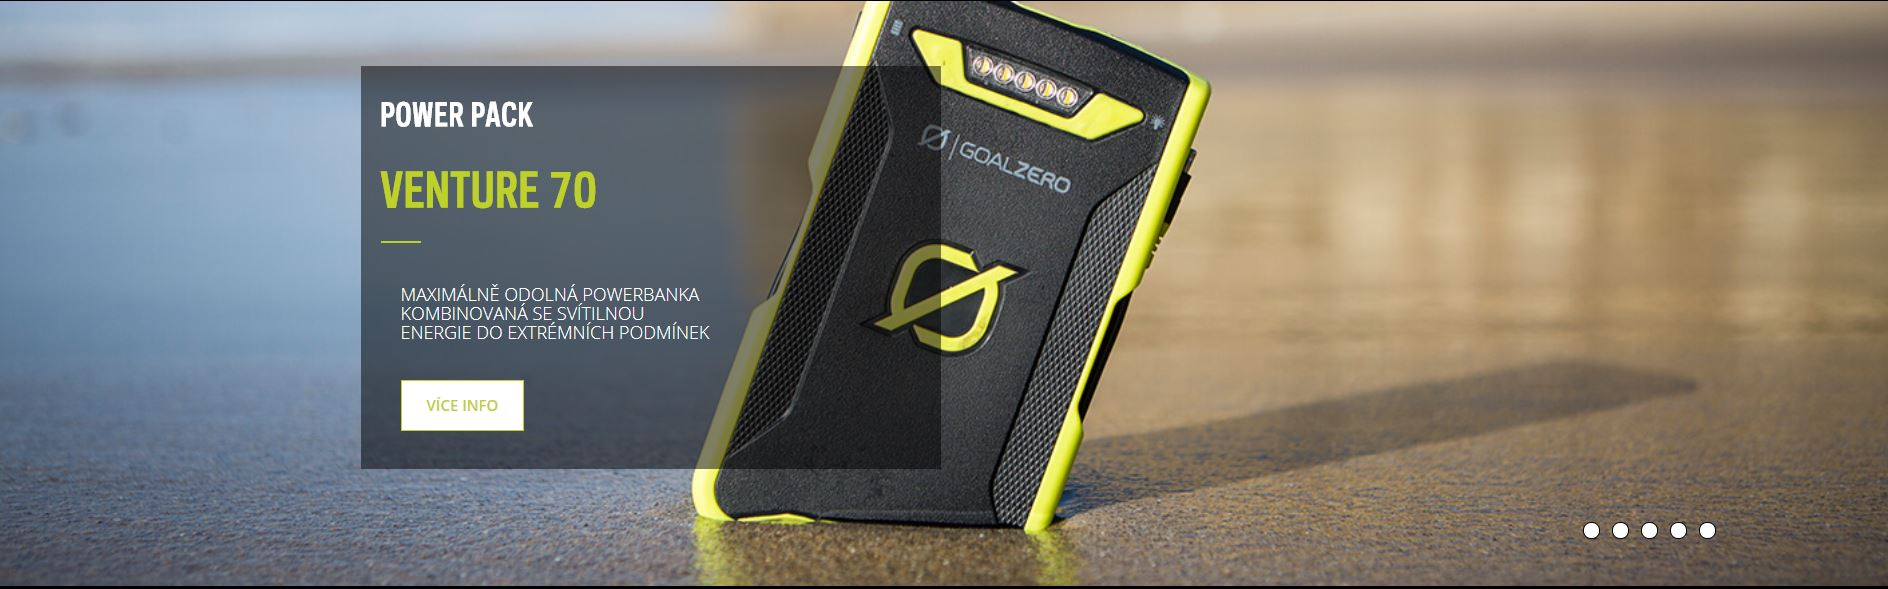 Venture 70 externí baterie